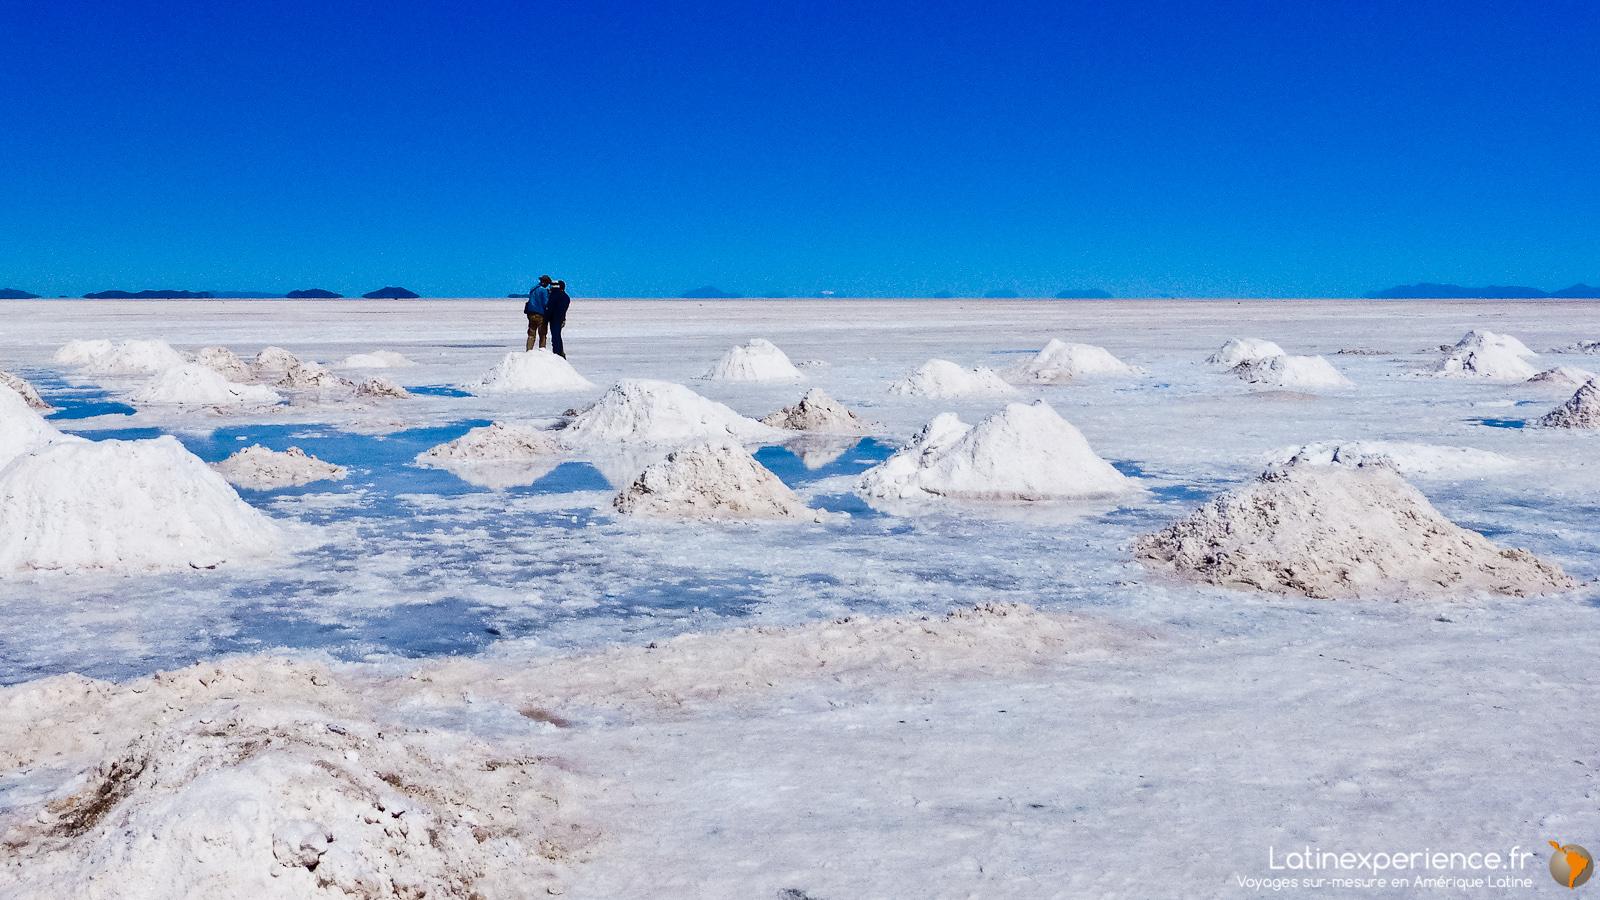 latinexperience voyages - Bolivie - Trek - Salar de Uyuni